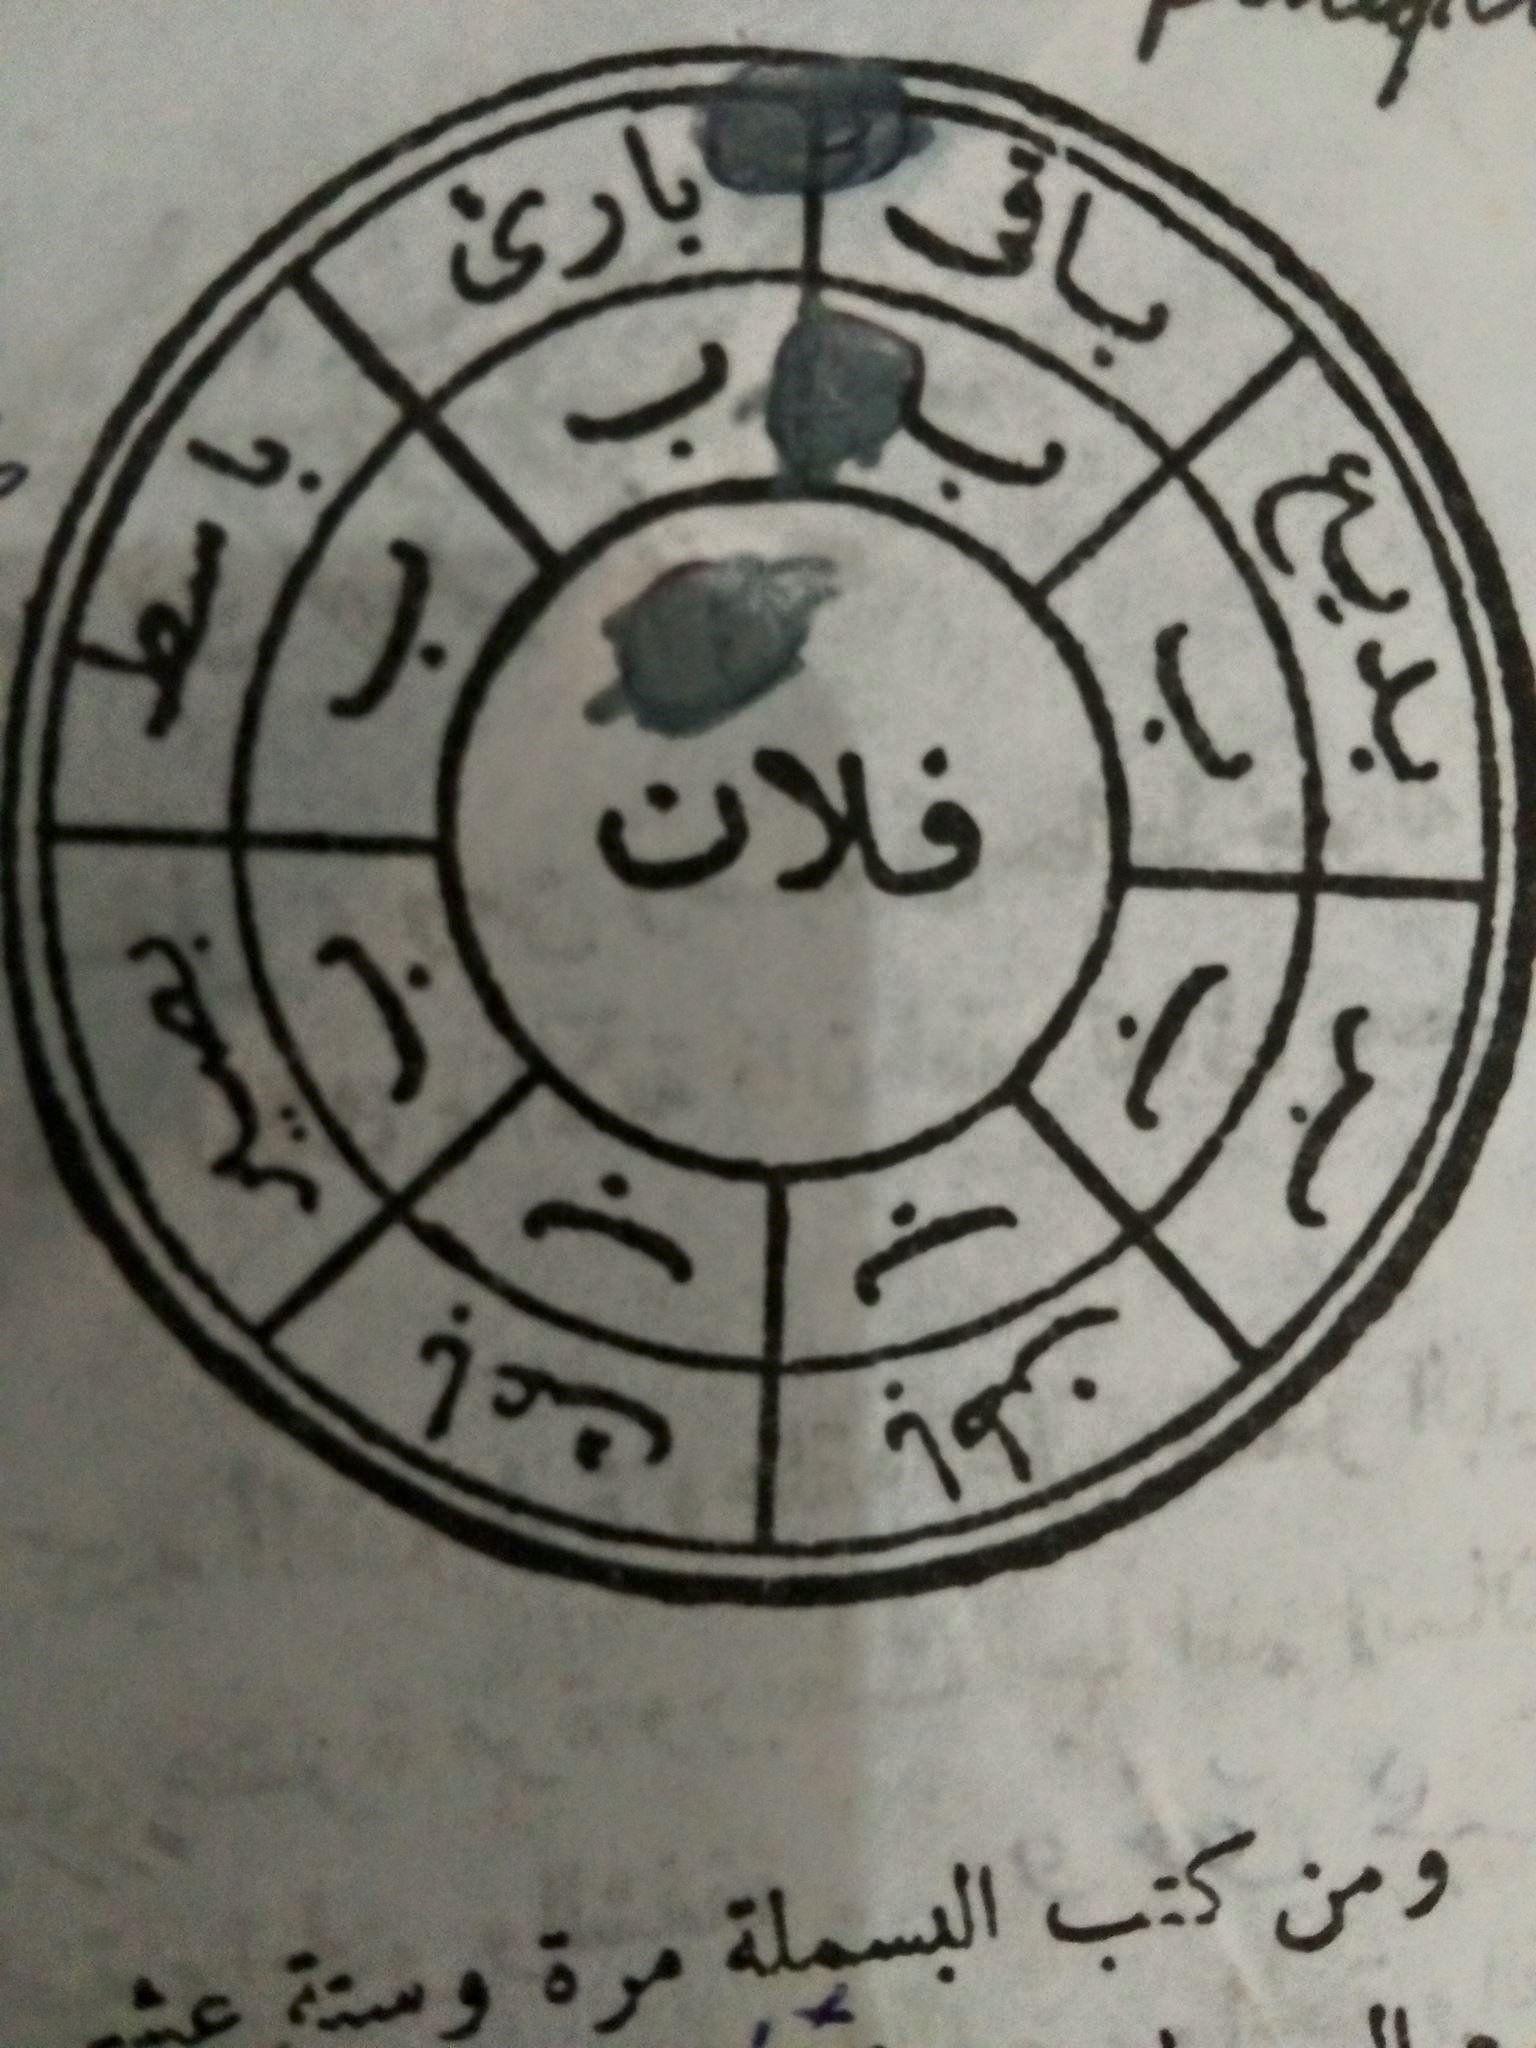 Pin By Mubarak Abdulsalam On Boommm Books Free Download Pdf Free Ebooks Download Books Pdf Books Download